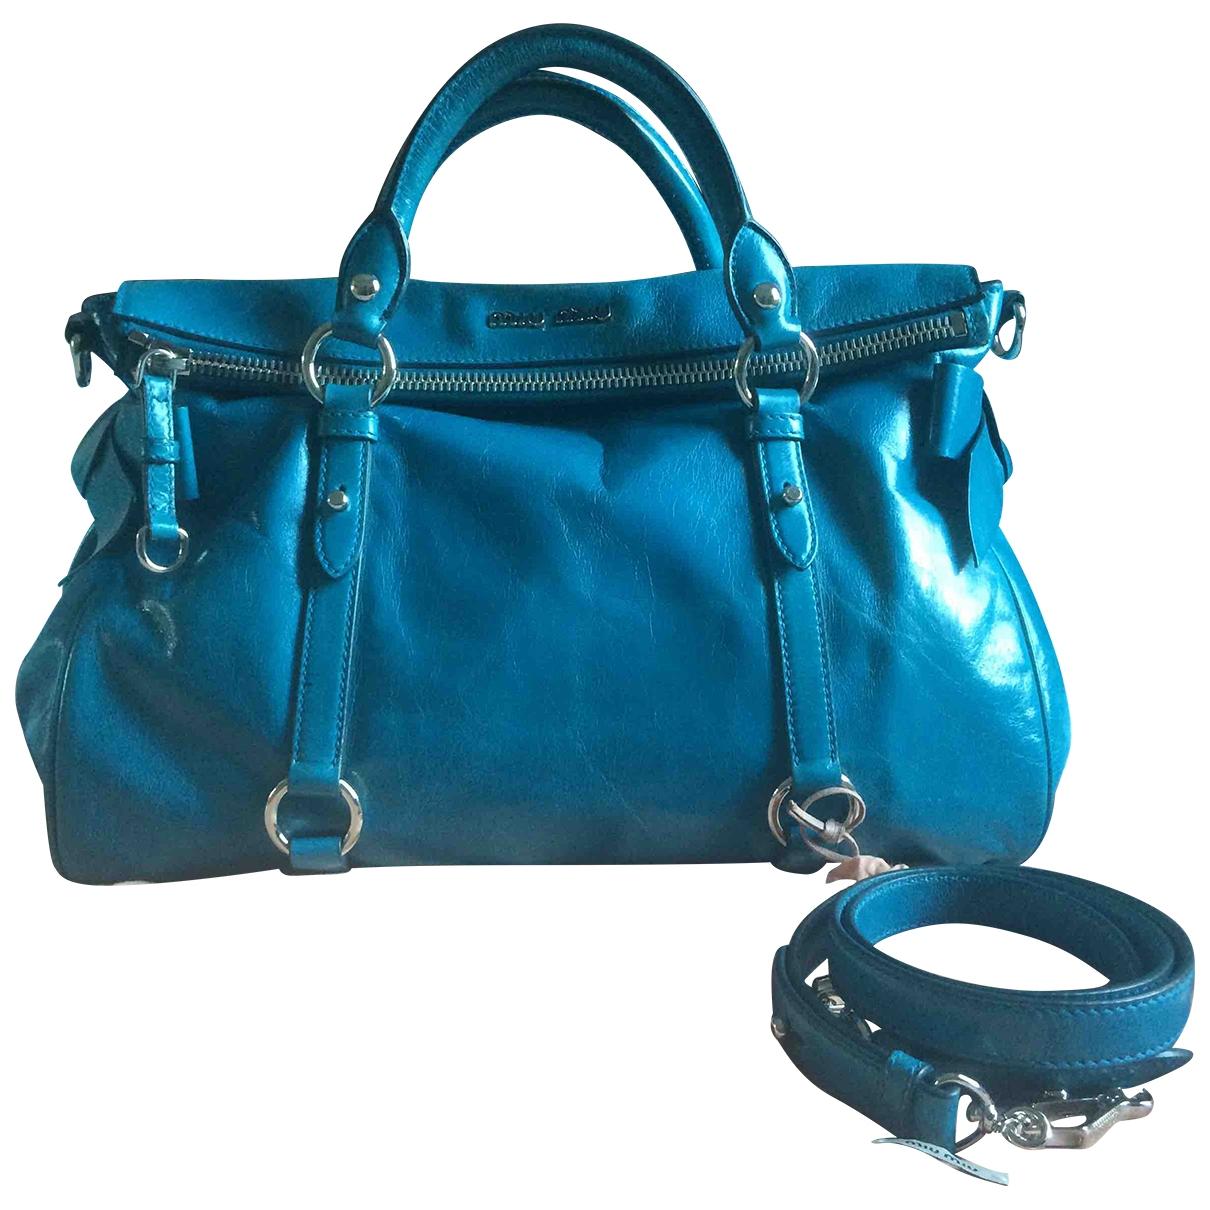 Miu Miu Bow bag Handtasche in  Tuerkis Leder